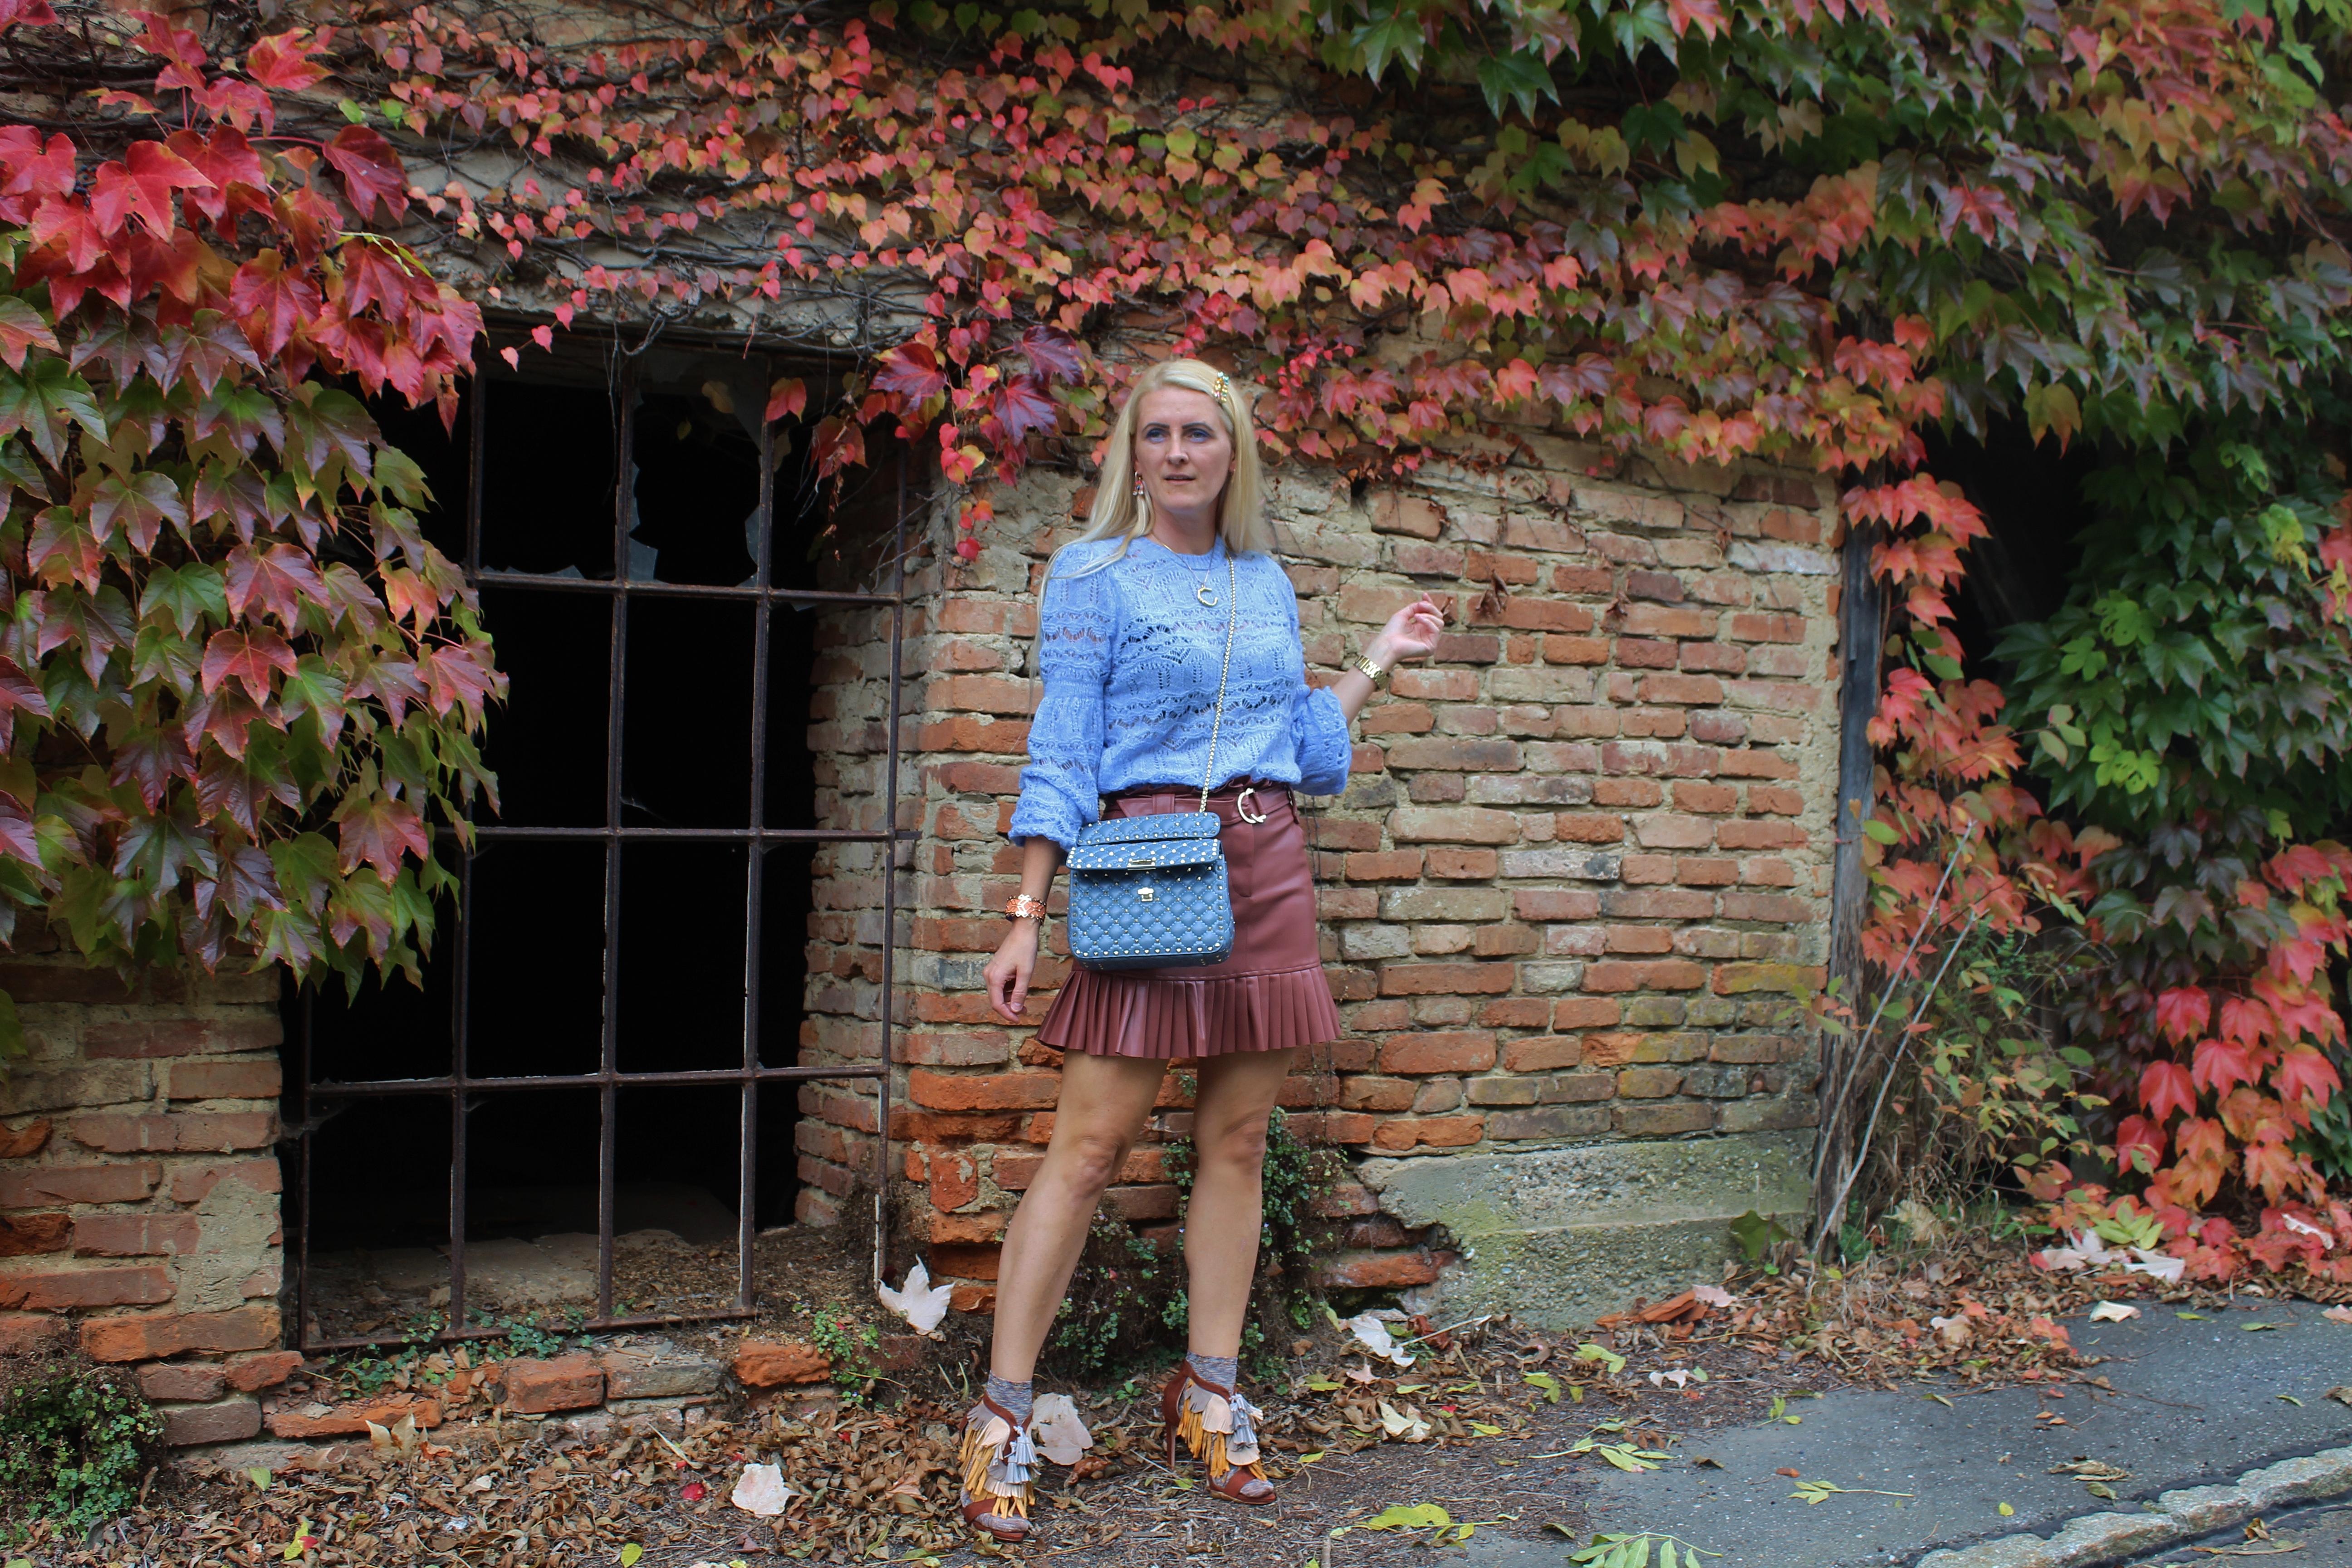 Fringed-Brown-Skirt-Blue-Sweater-Fashionsocks-Sandals-carrieslifestyle-Tamara-Prutsch